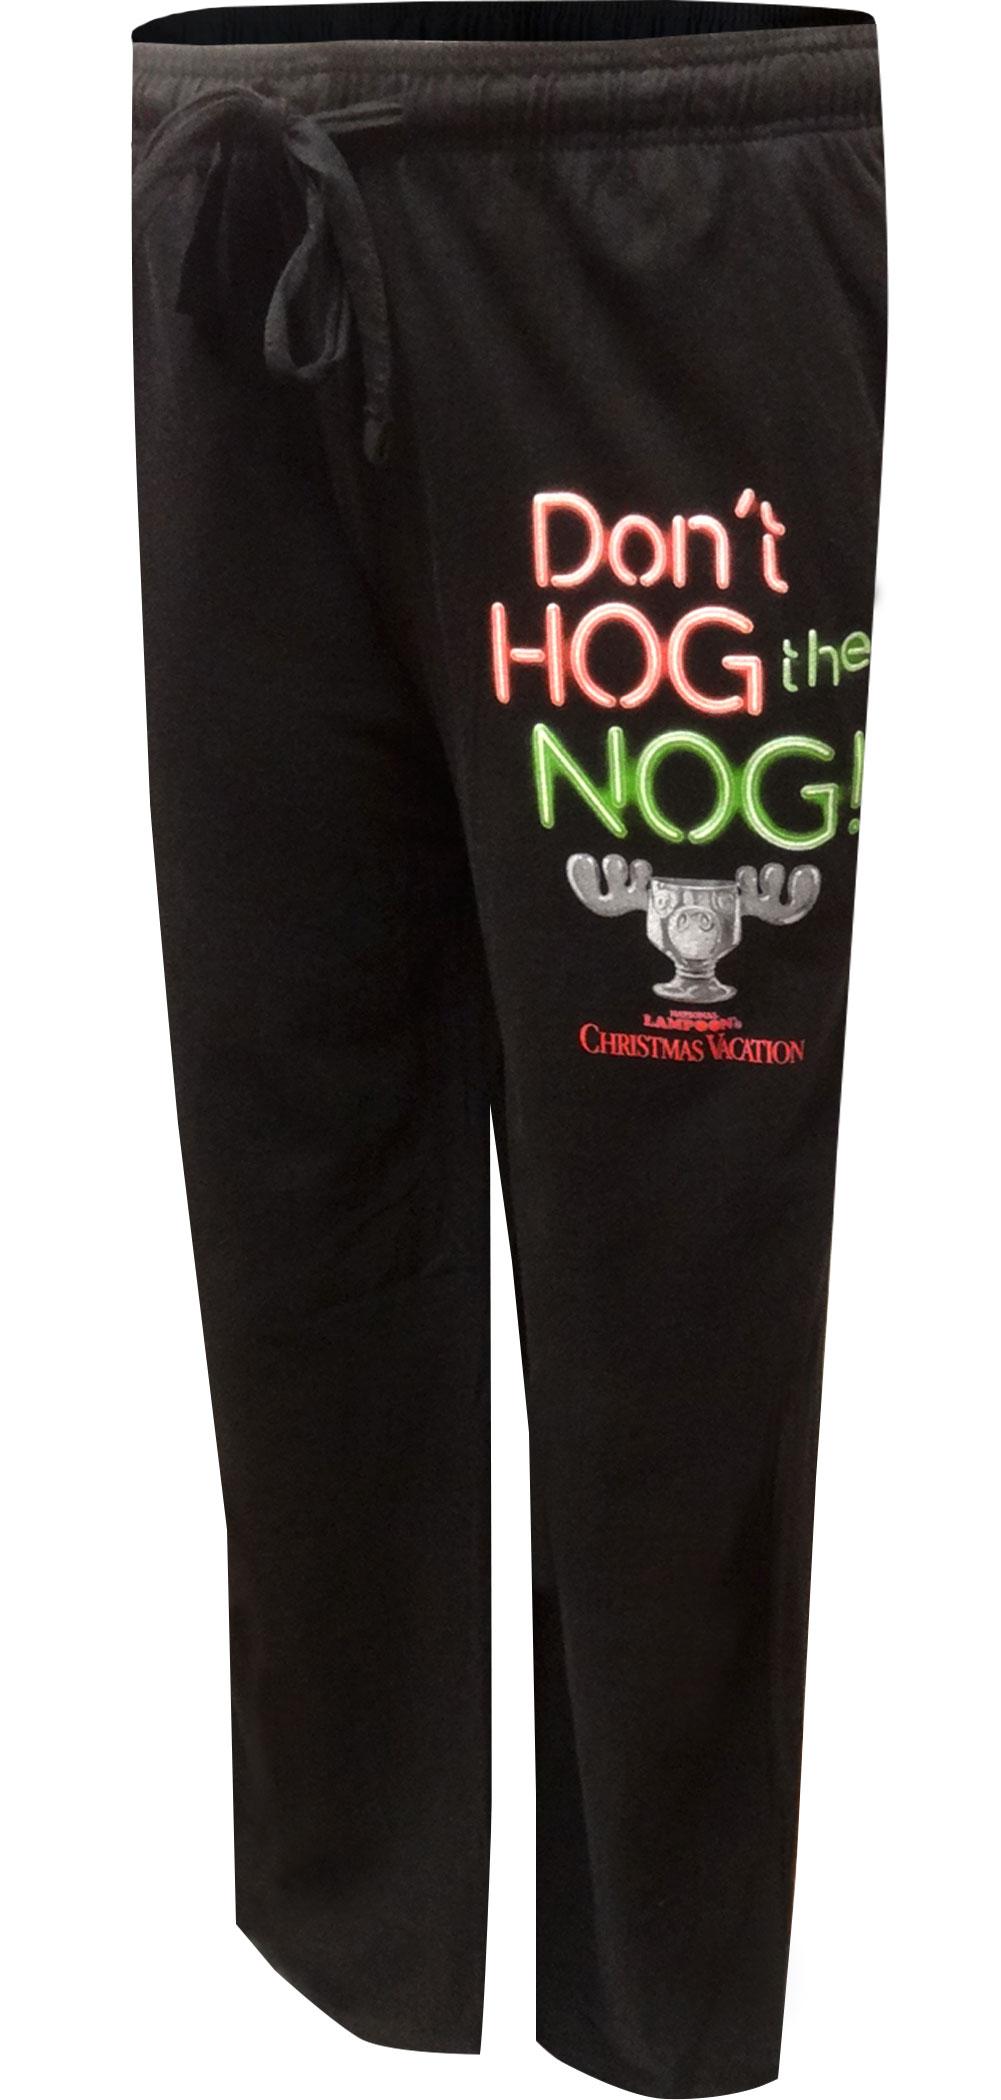 Image of Christmas Vacation Don't Hog The Nog Lounge Pants for men